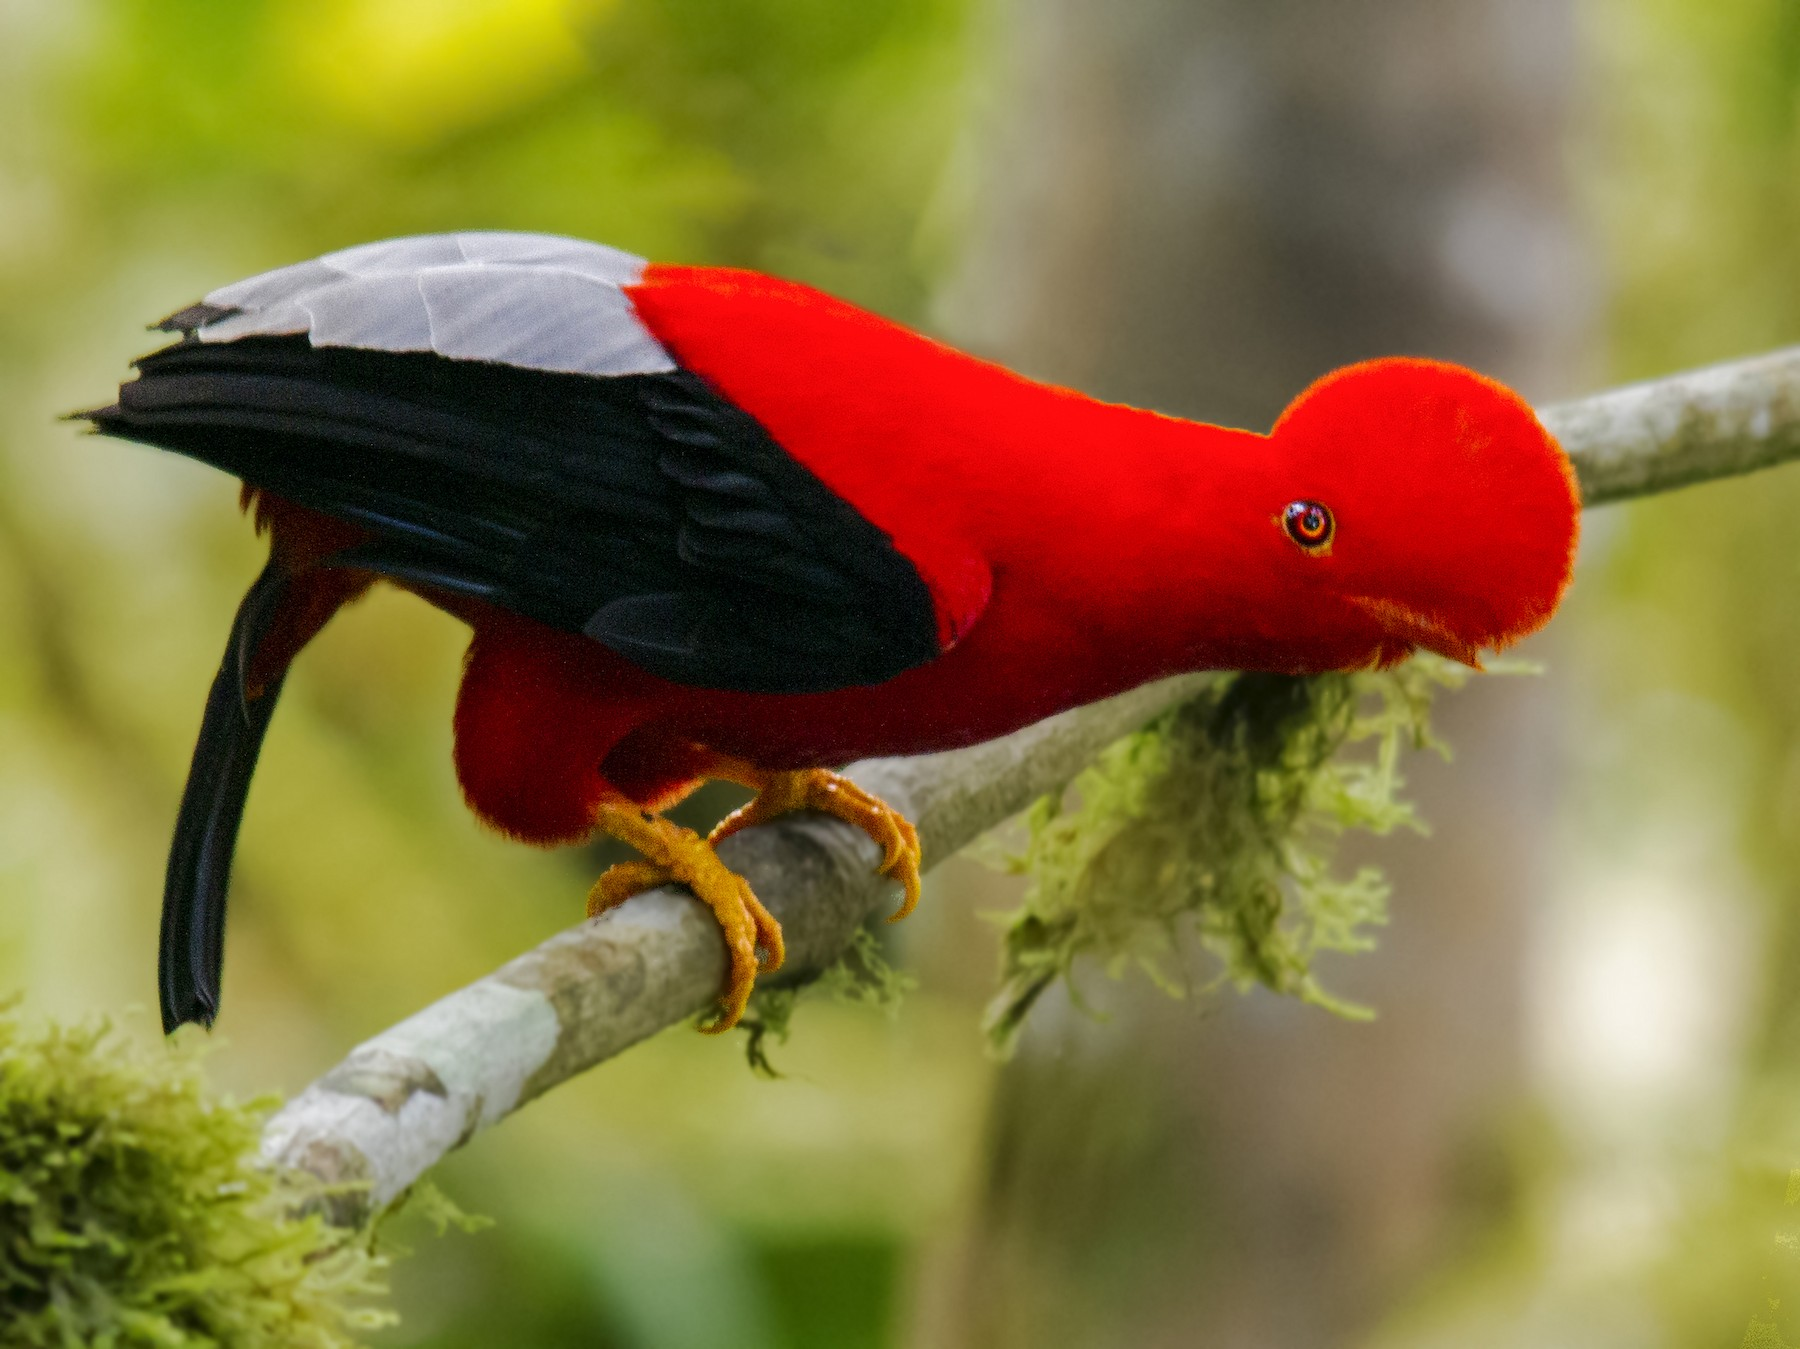 Andean Cock-of-the-rock - Andres Vasquez Noboa - Tropical Birding Tours